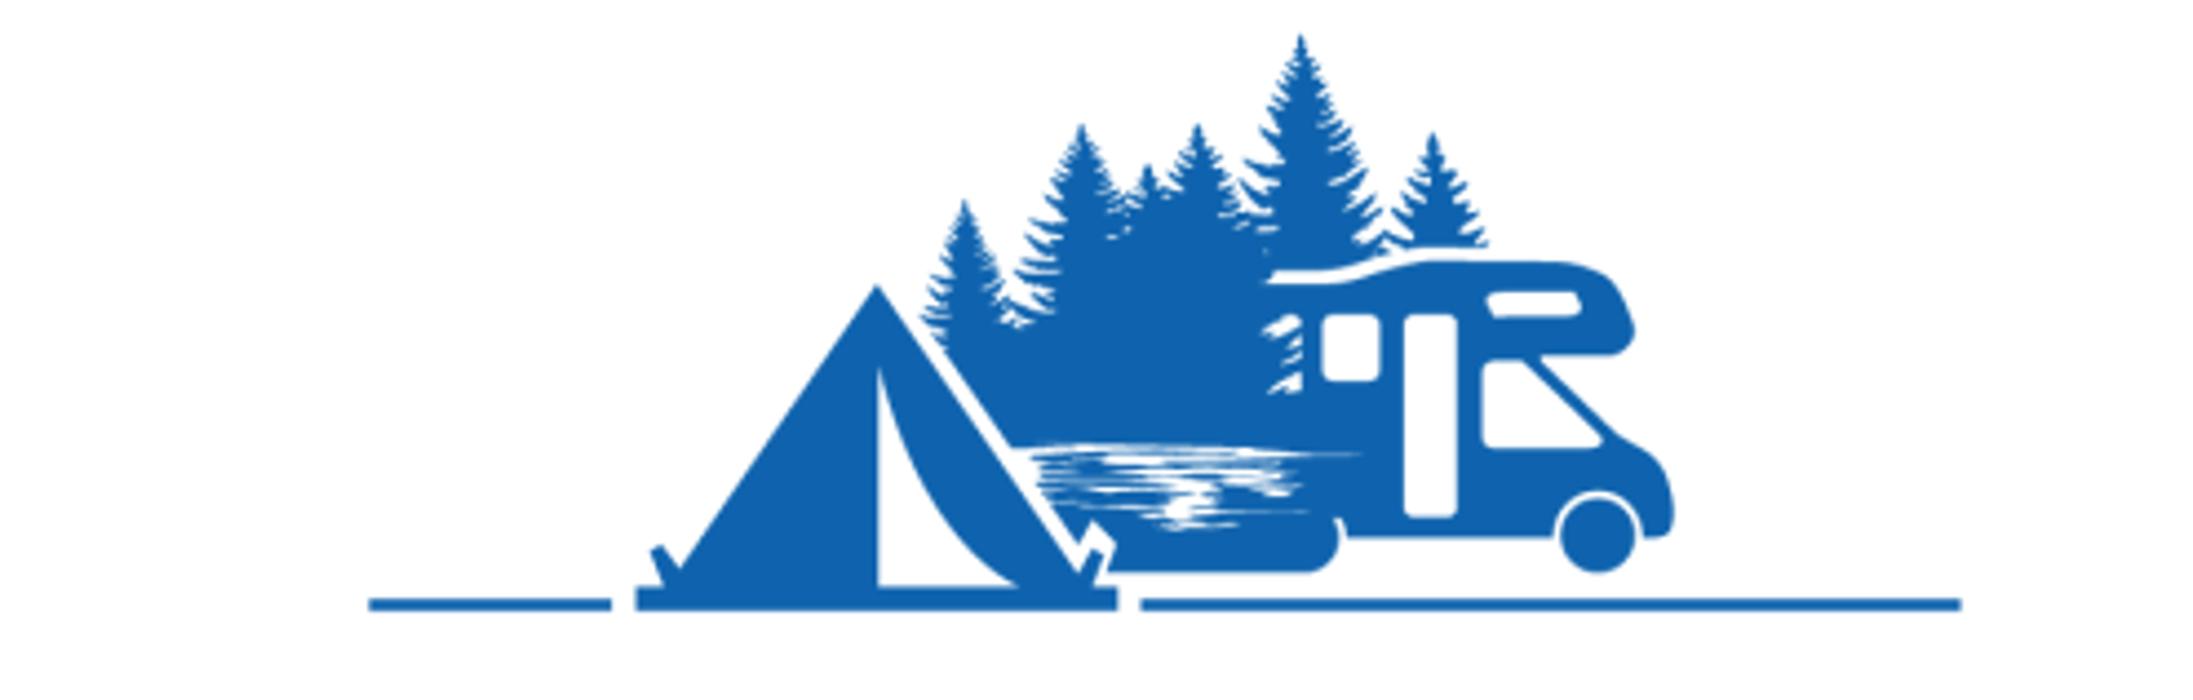 Mittelelbe Tourismus GmbH Campingplatz